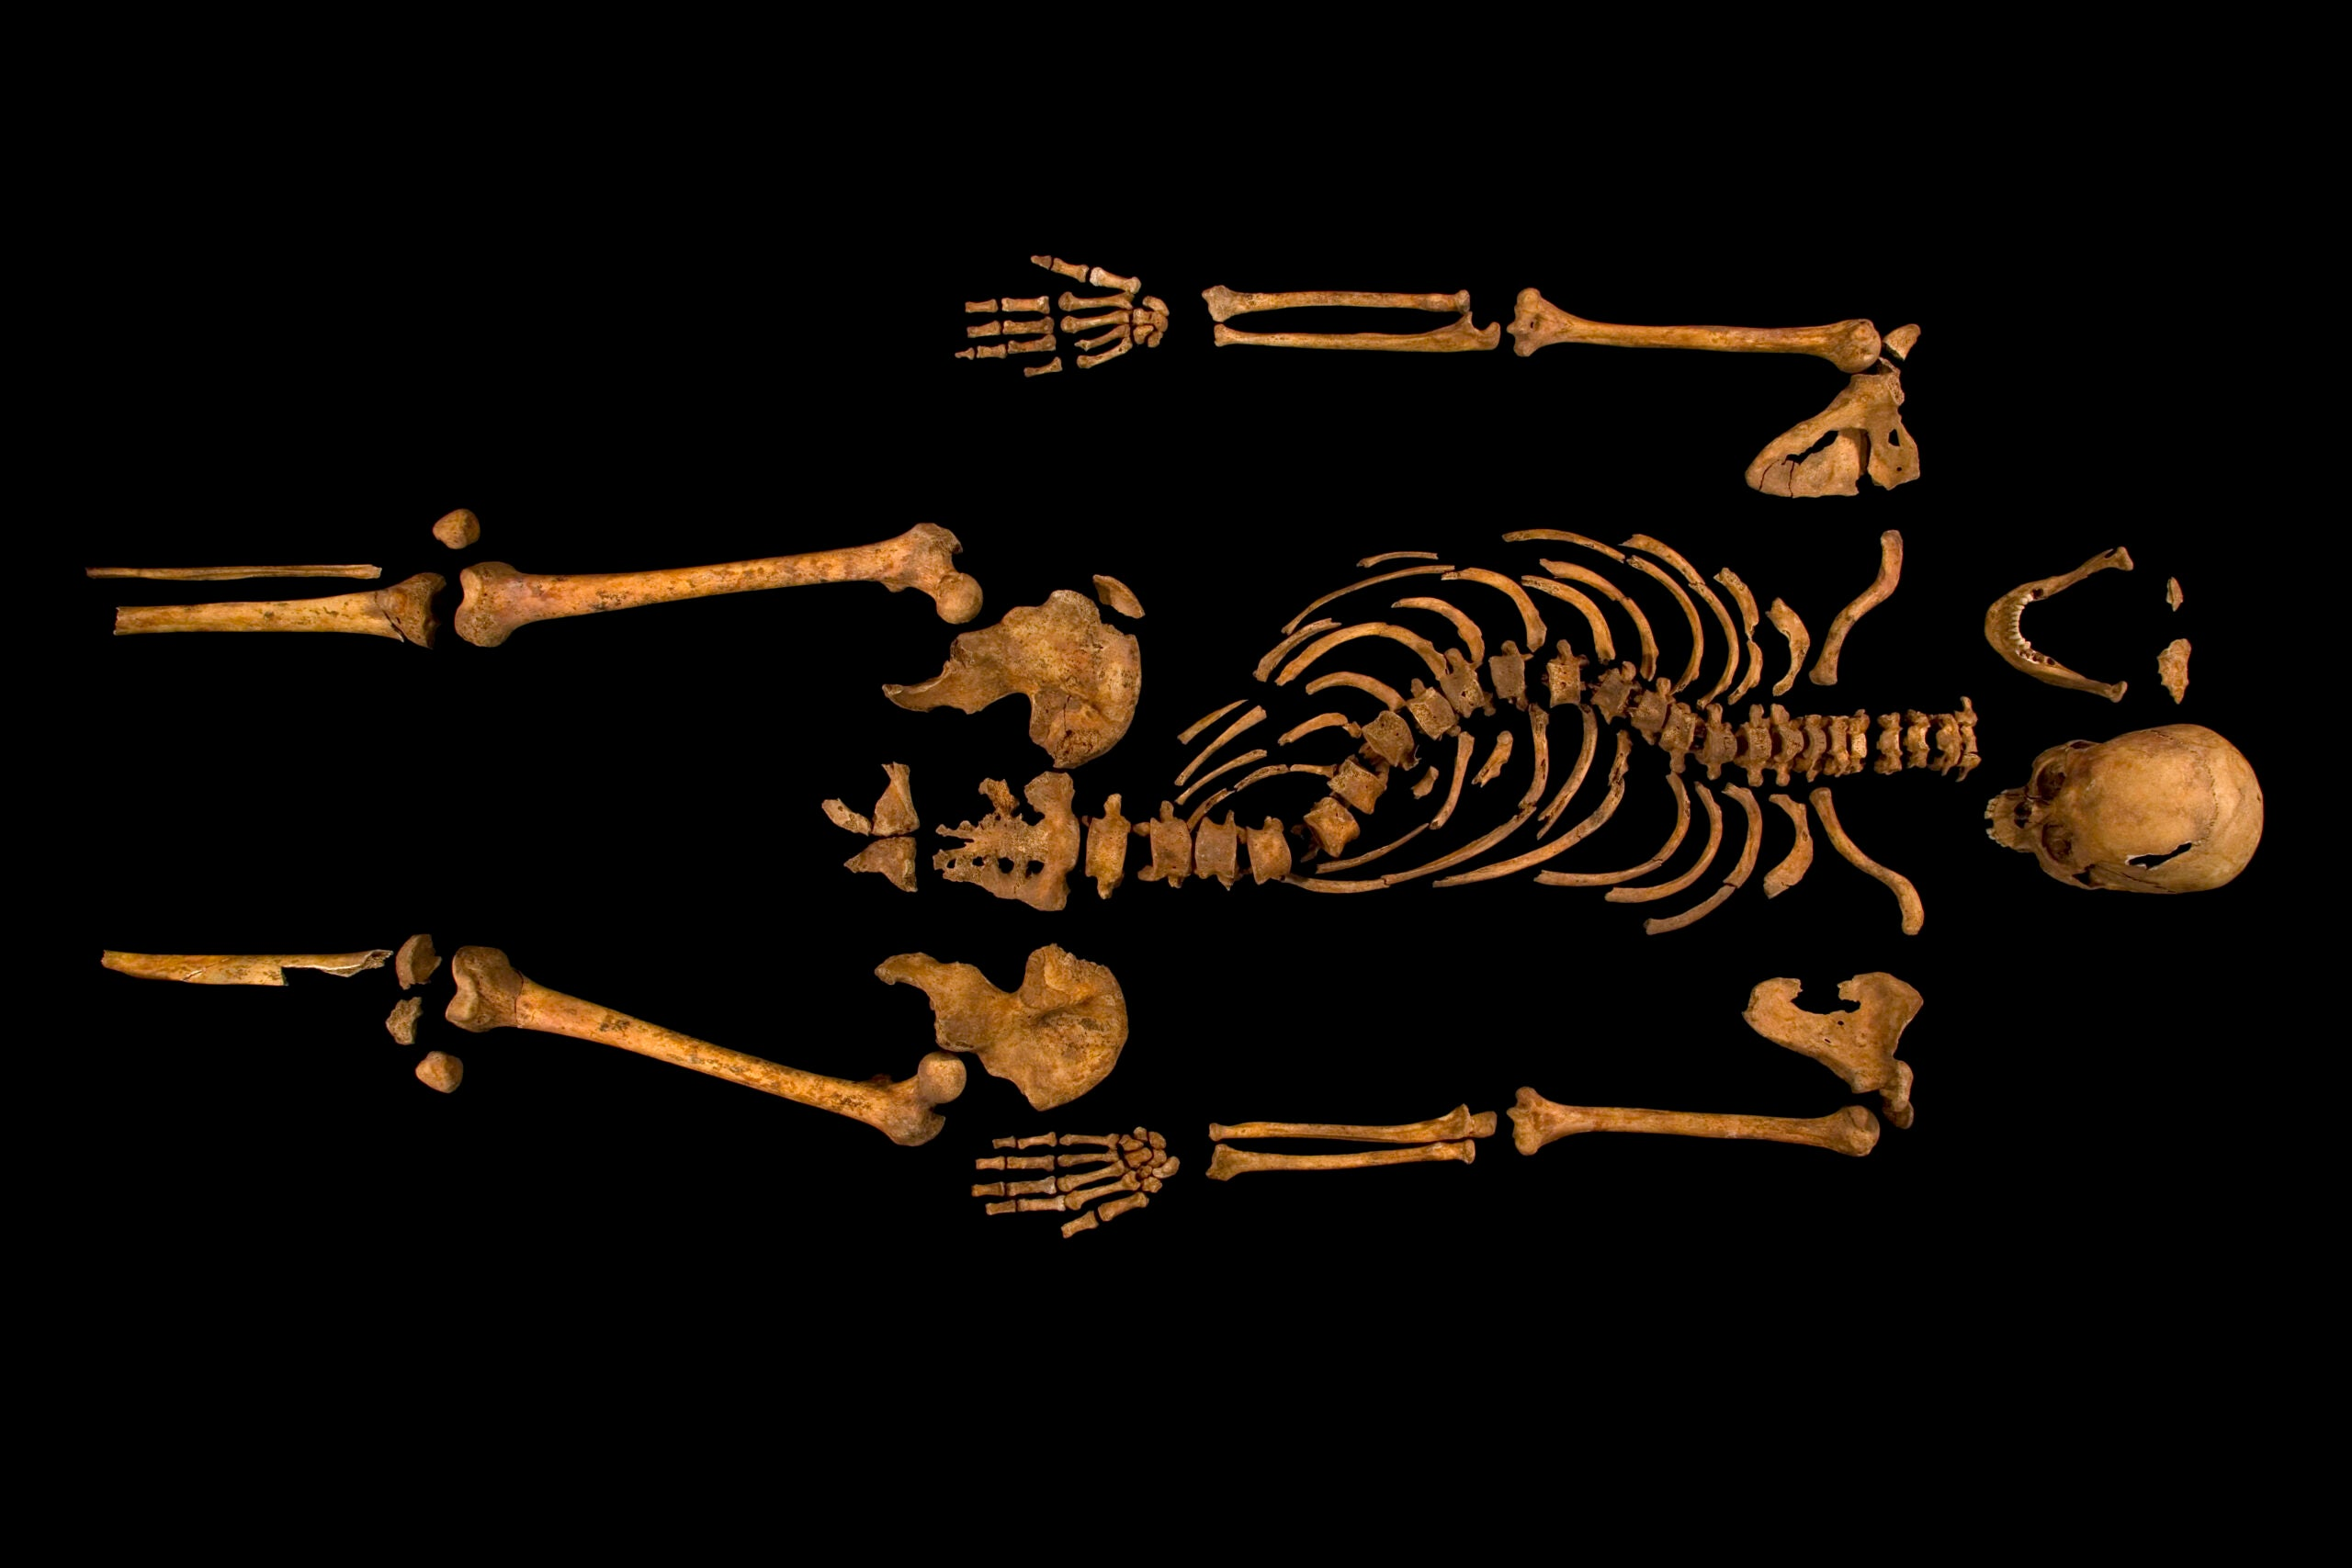 Explore A 3D Model Of Richard III's Parking-Lot Grave